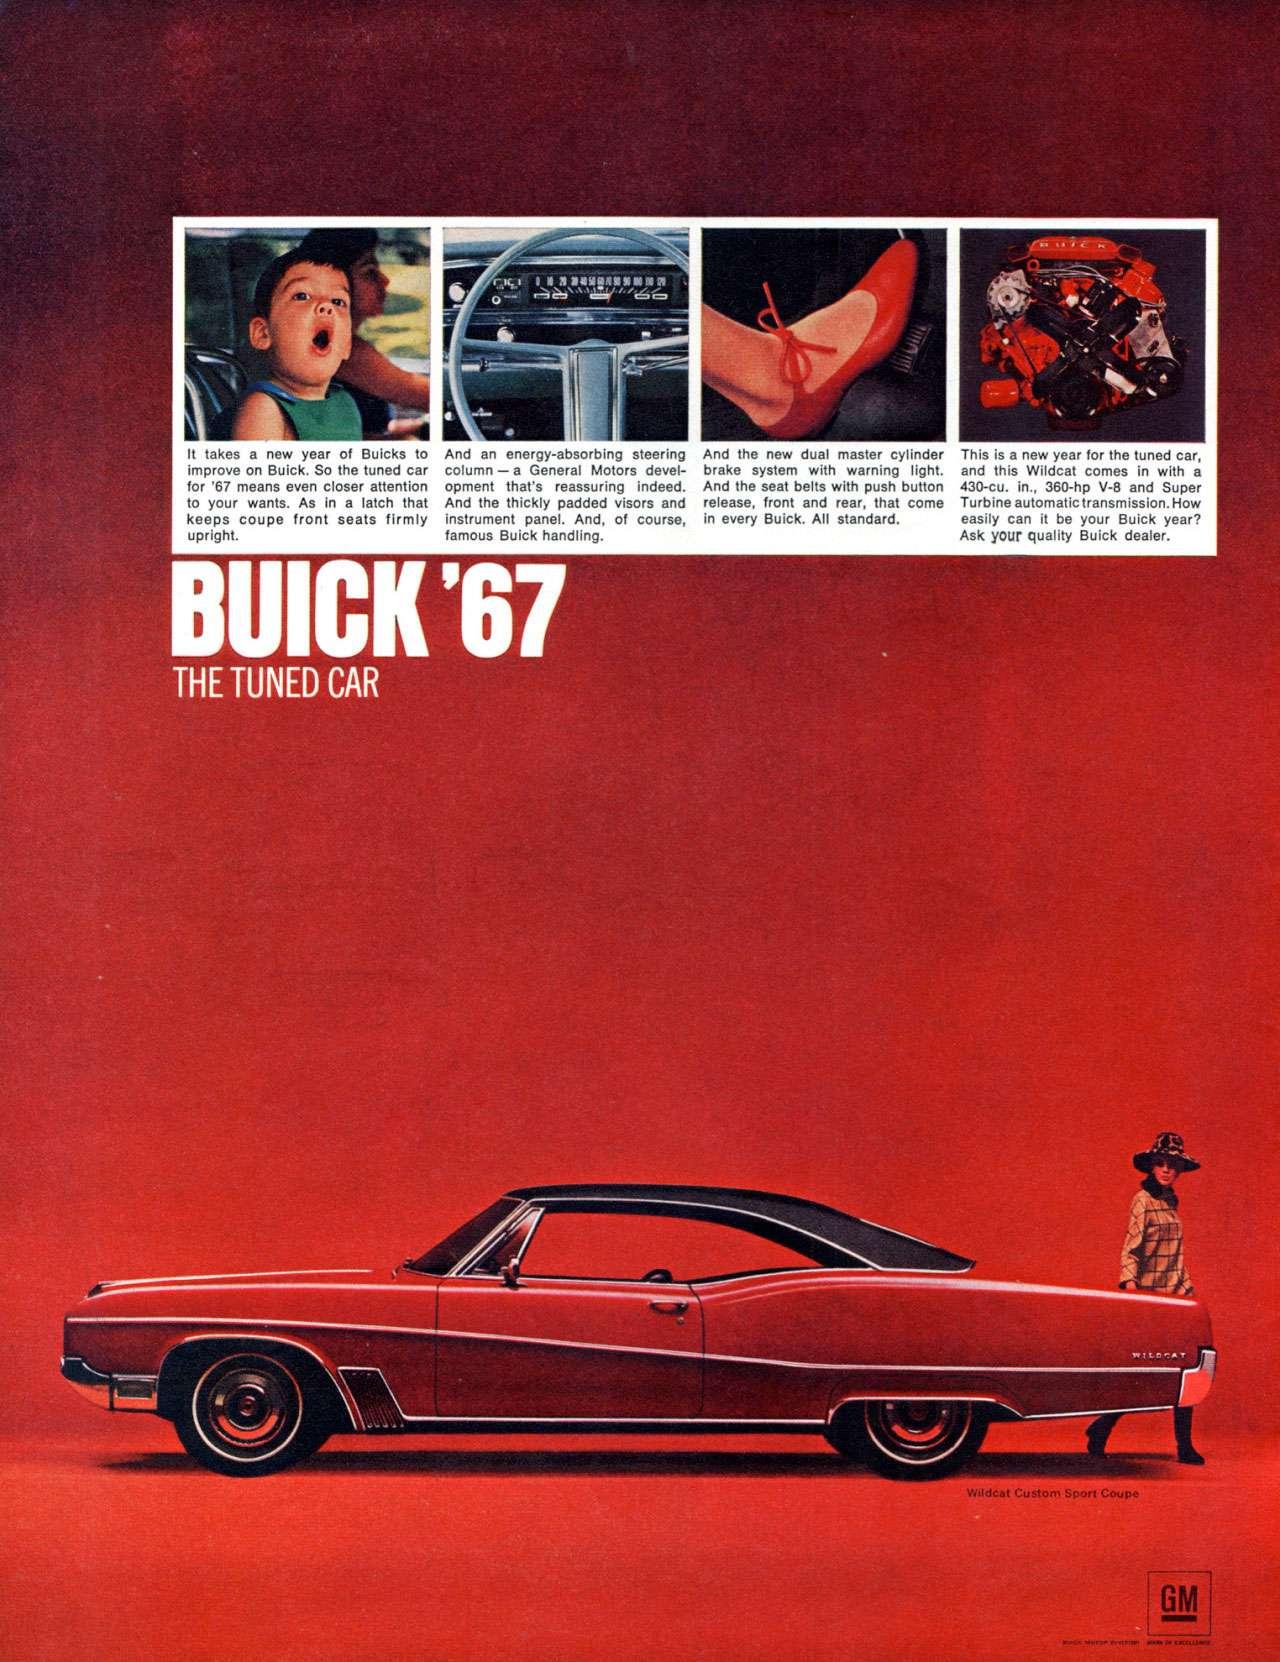 The 1967 Buick Wildcat Custom Sport Coupé. The tuned car.